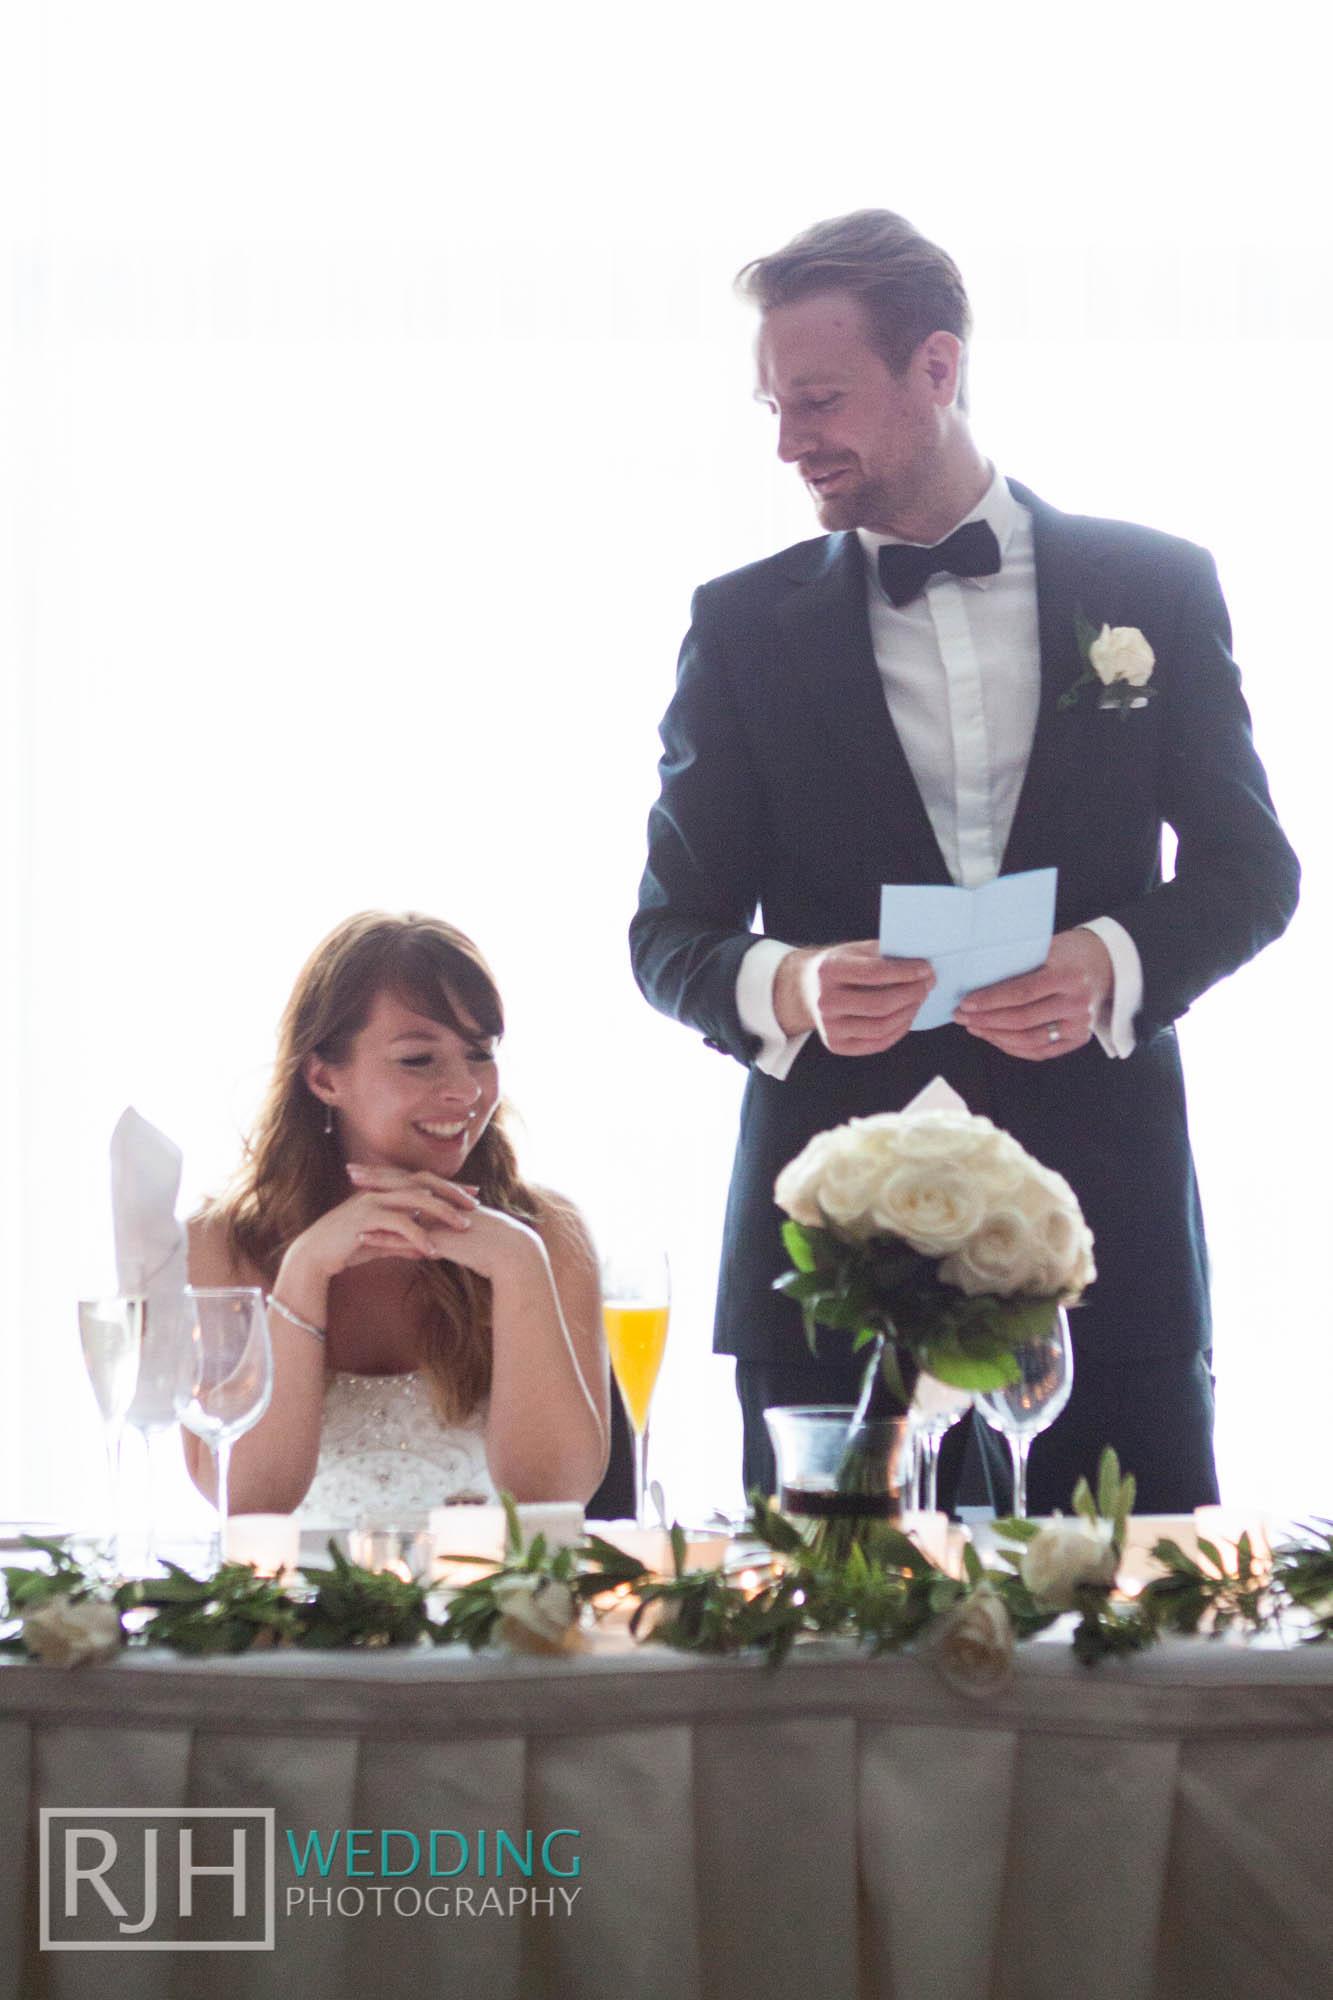 RJH Wedding Photography_2014 highlights_27.jpg